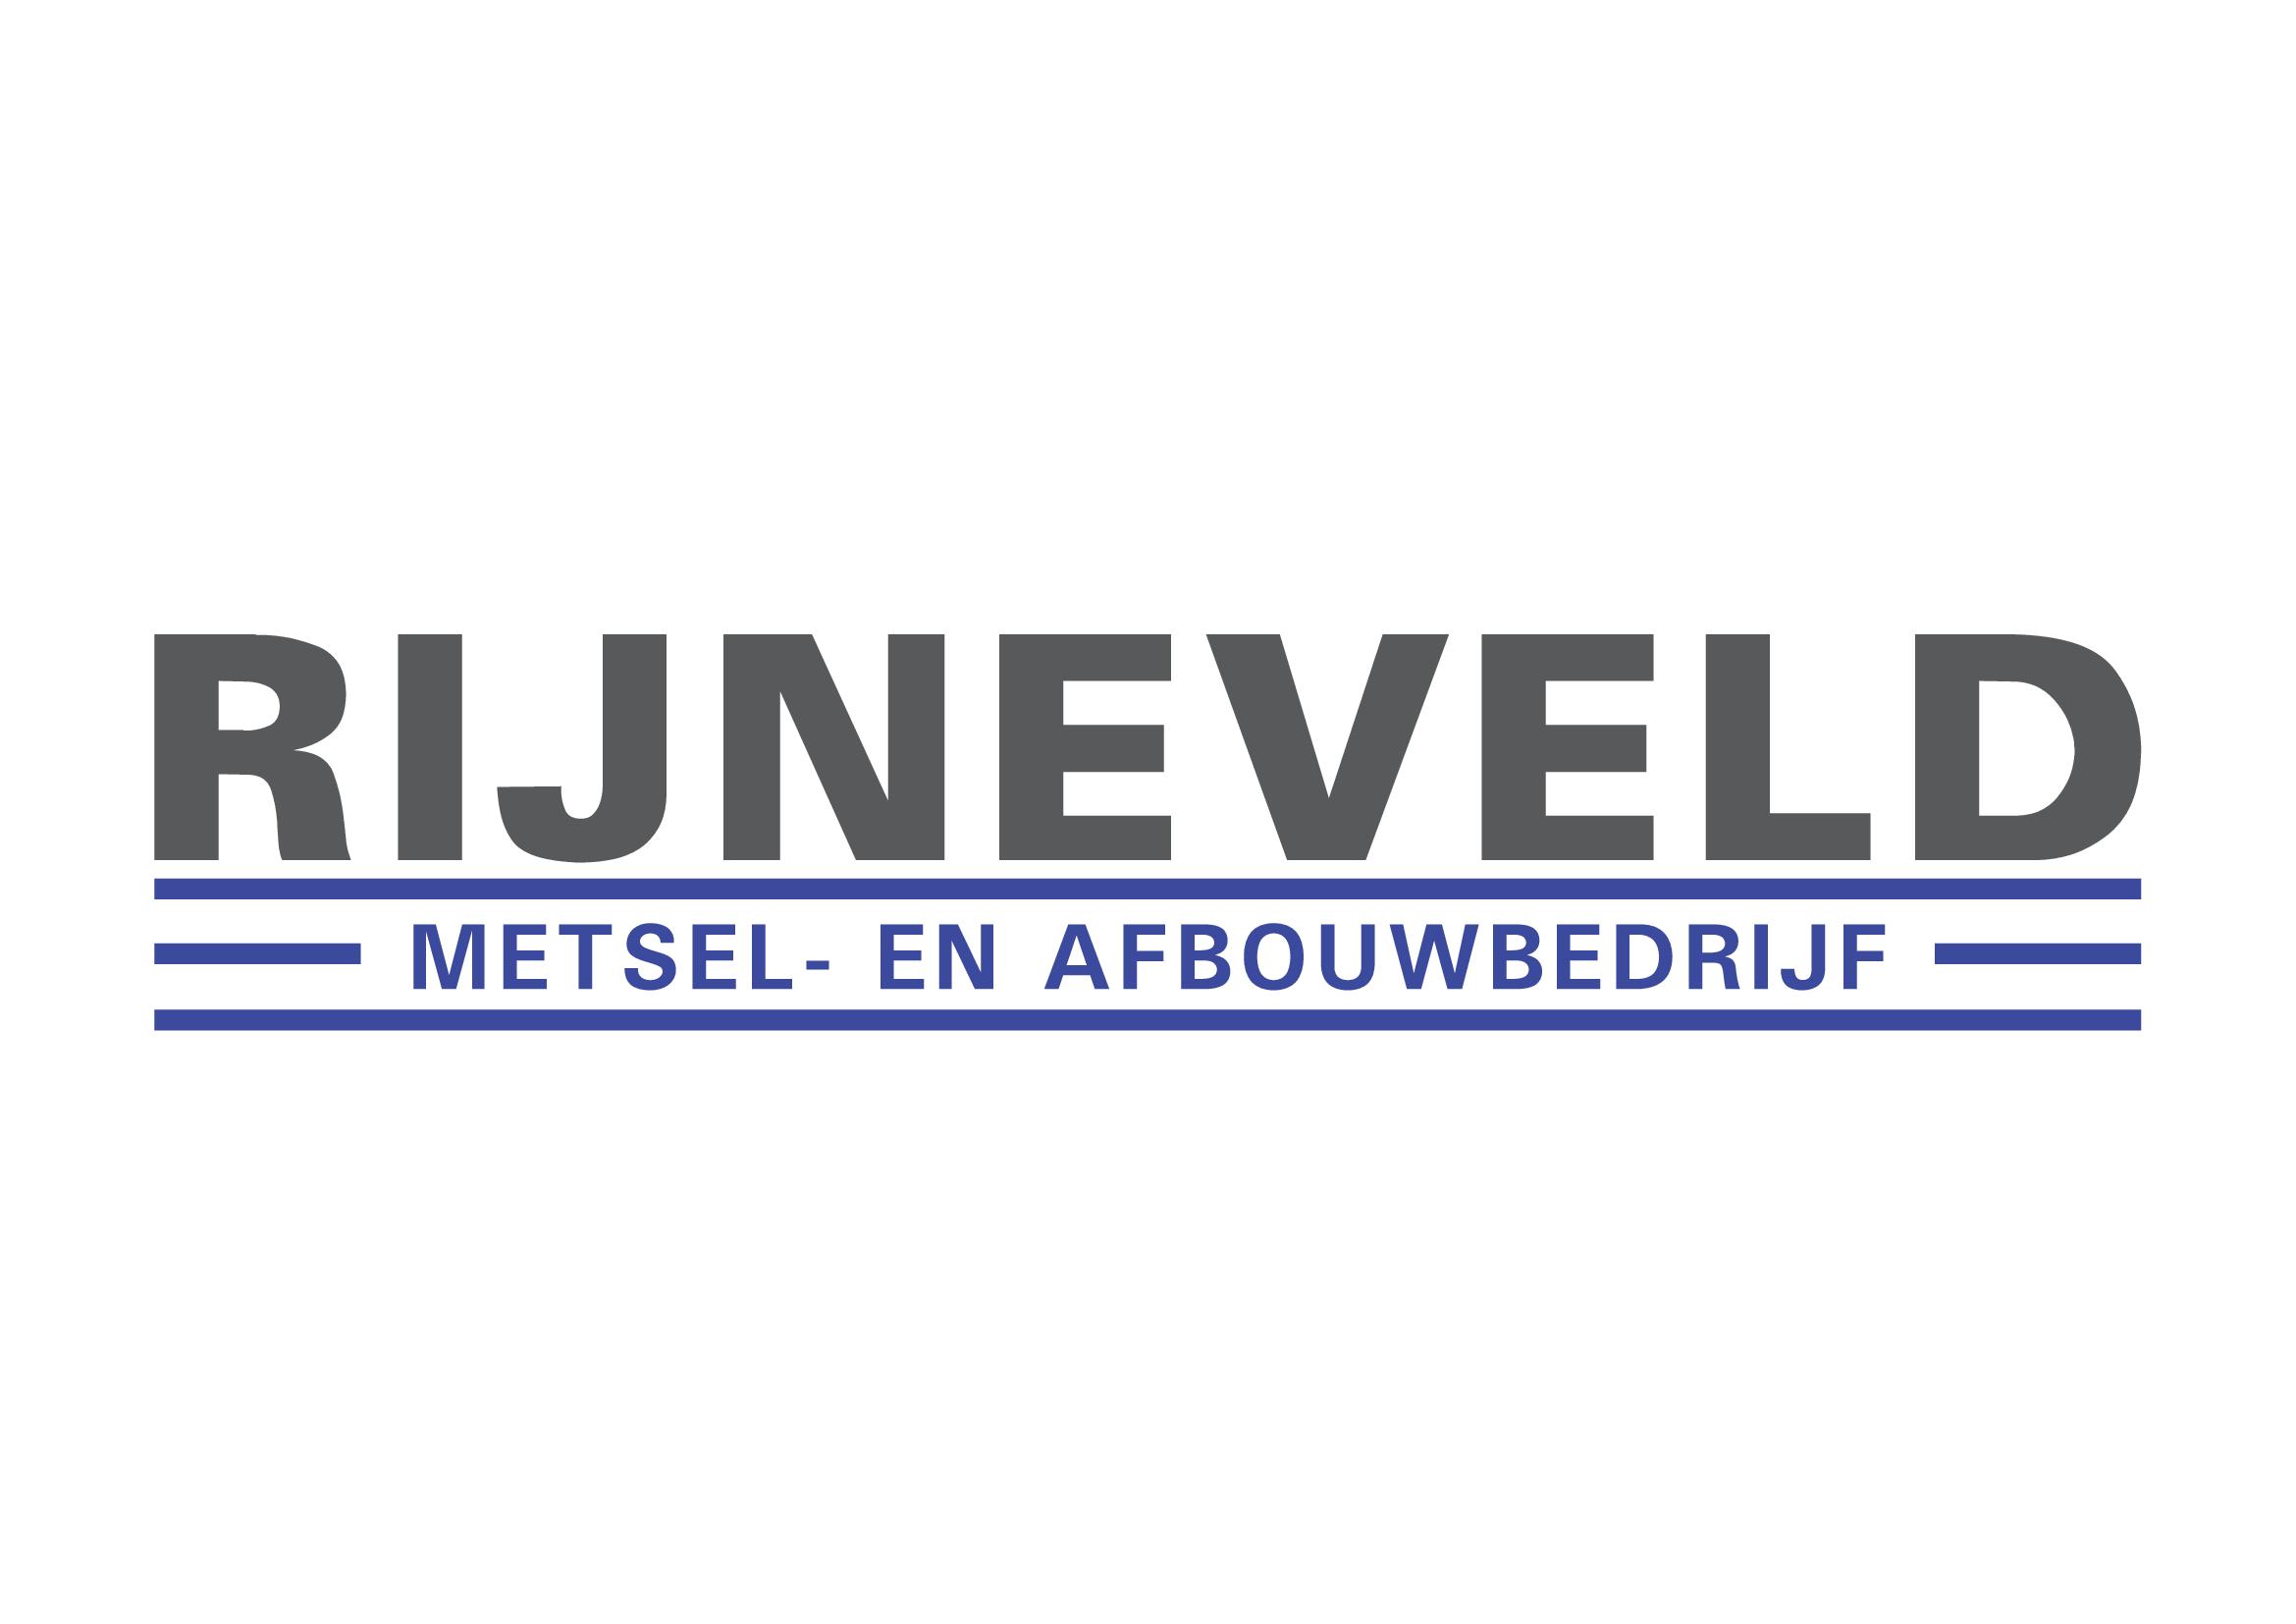 Rijneveld-logo_1195_